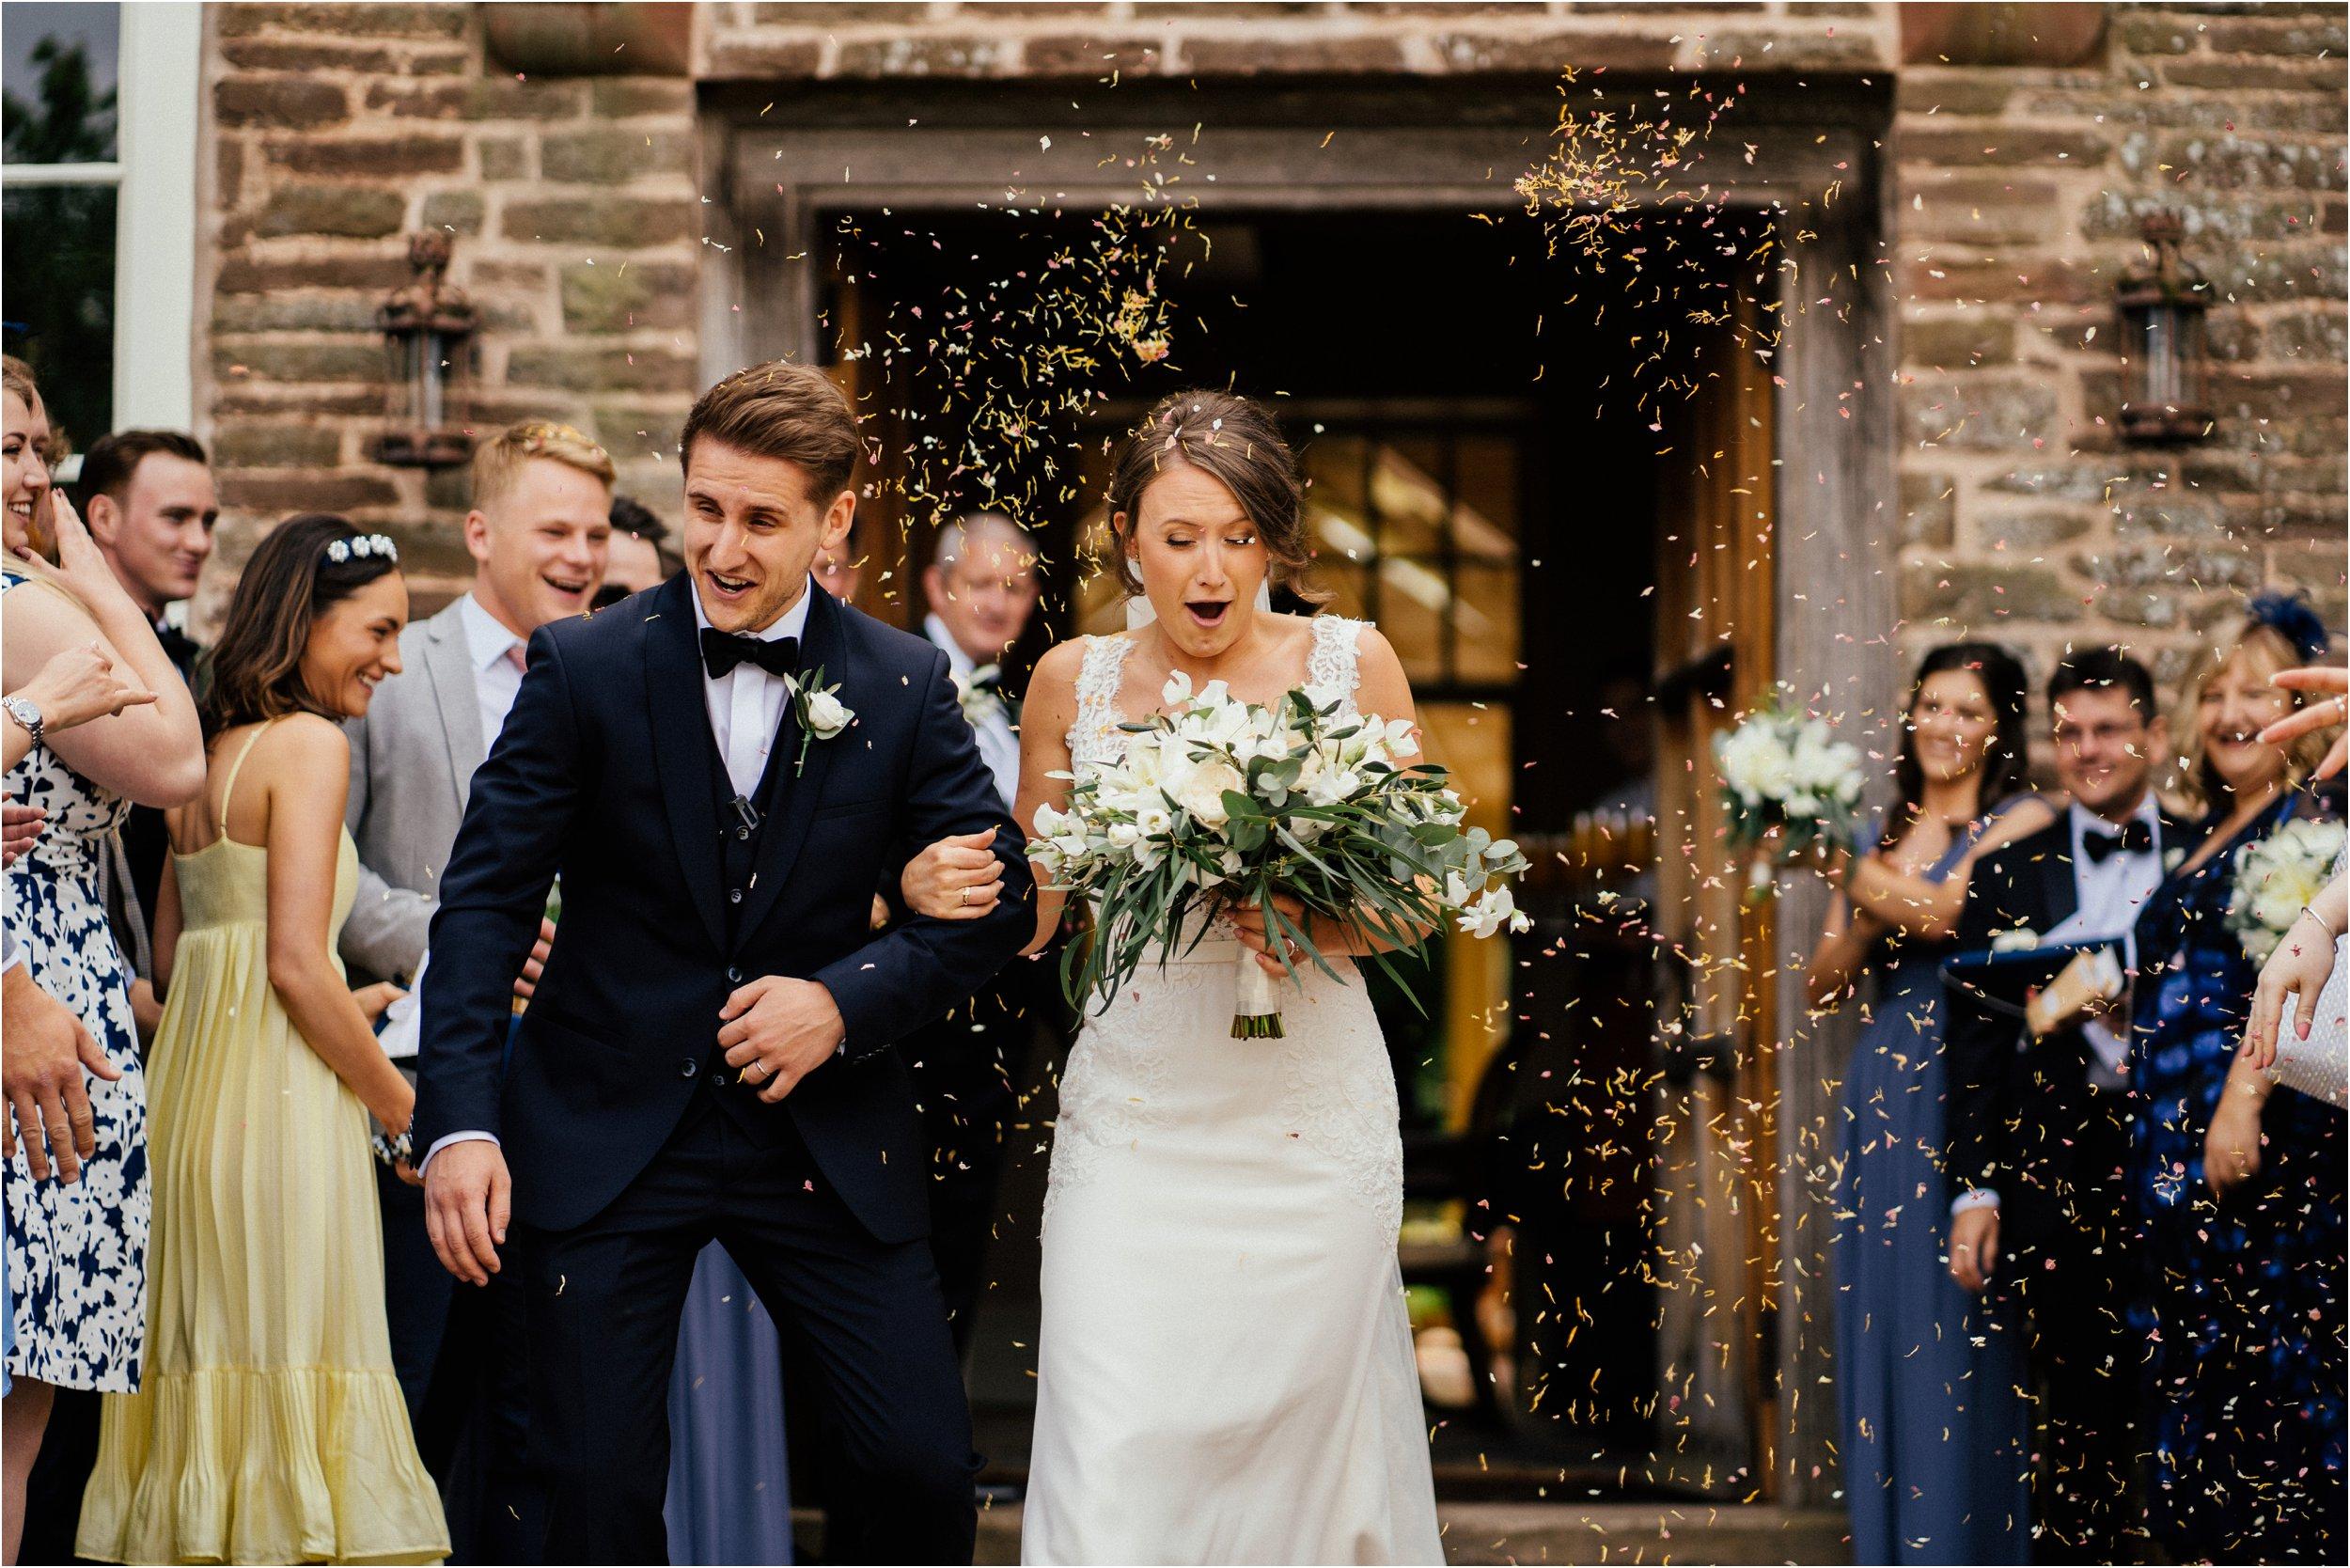 Dewsall Court Herefordshire wedding photographer_0054.jpg